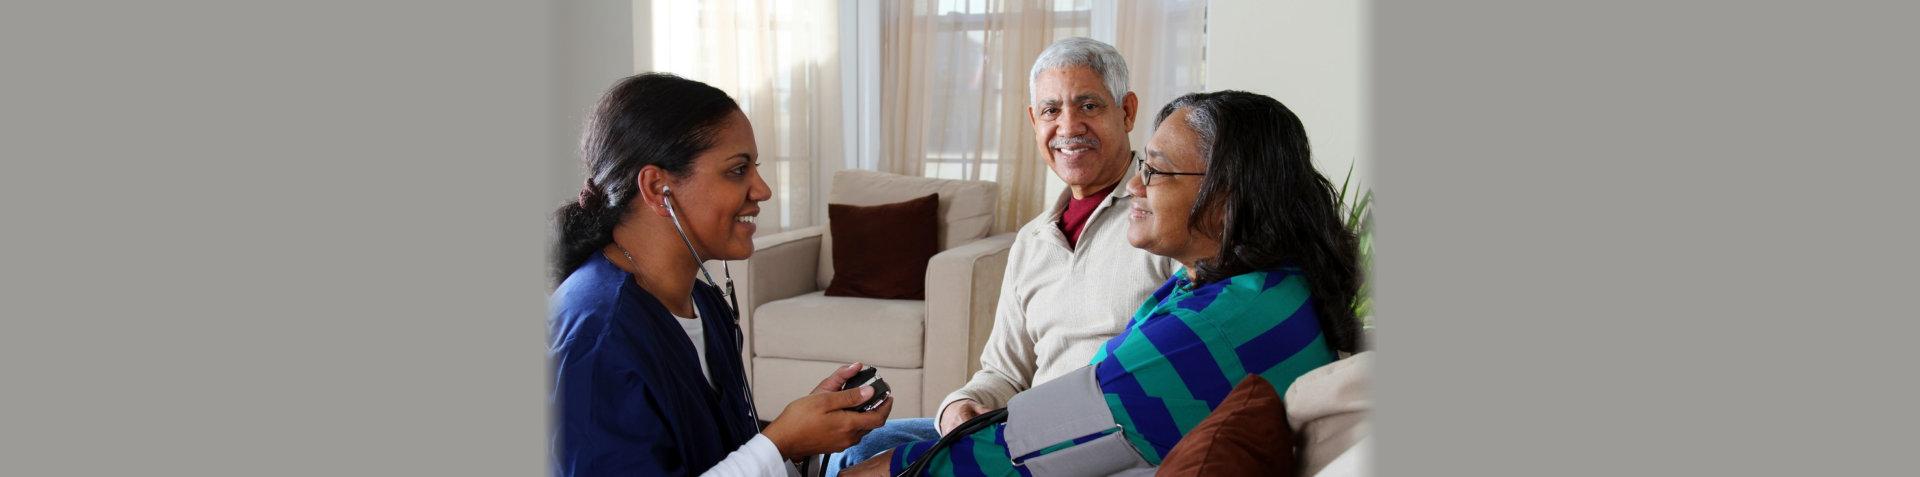 caretaker checking blood pressure on a senior